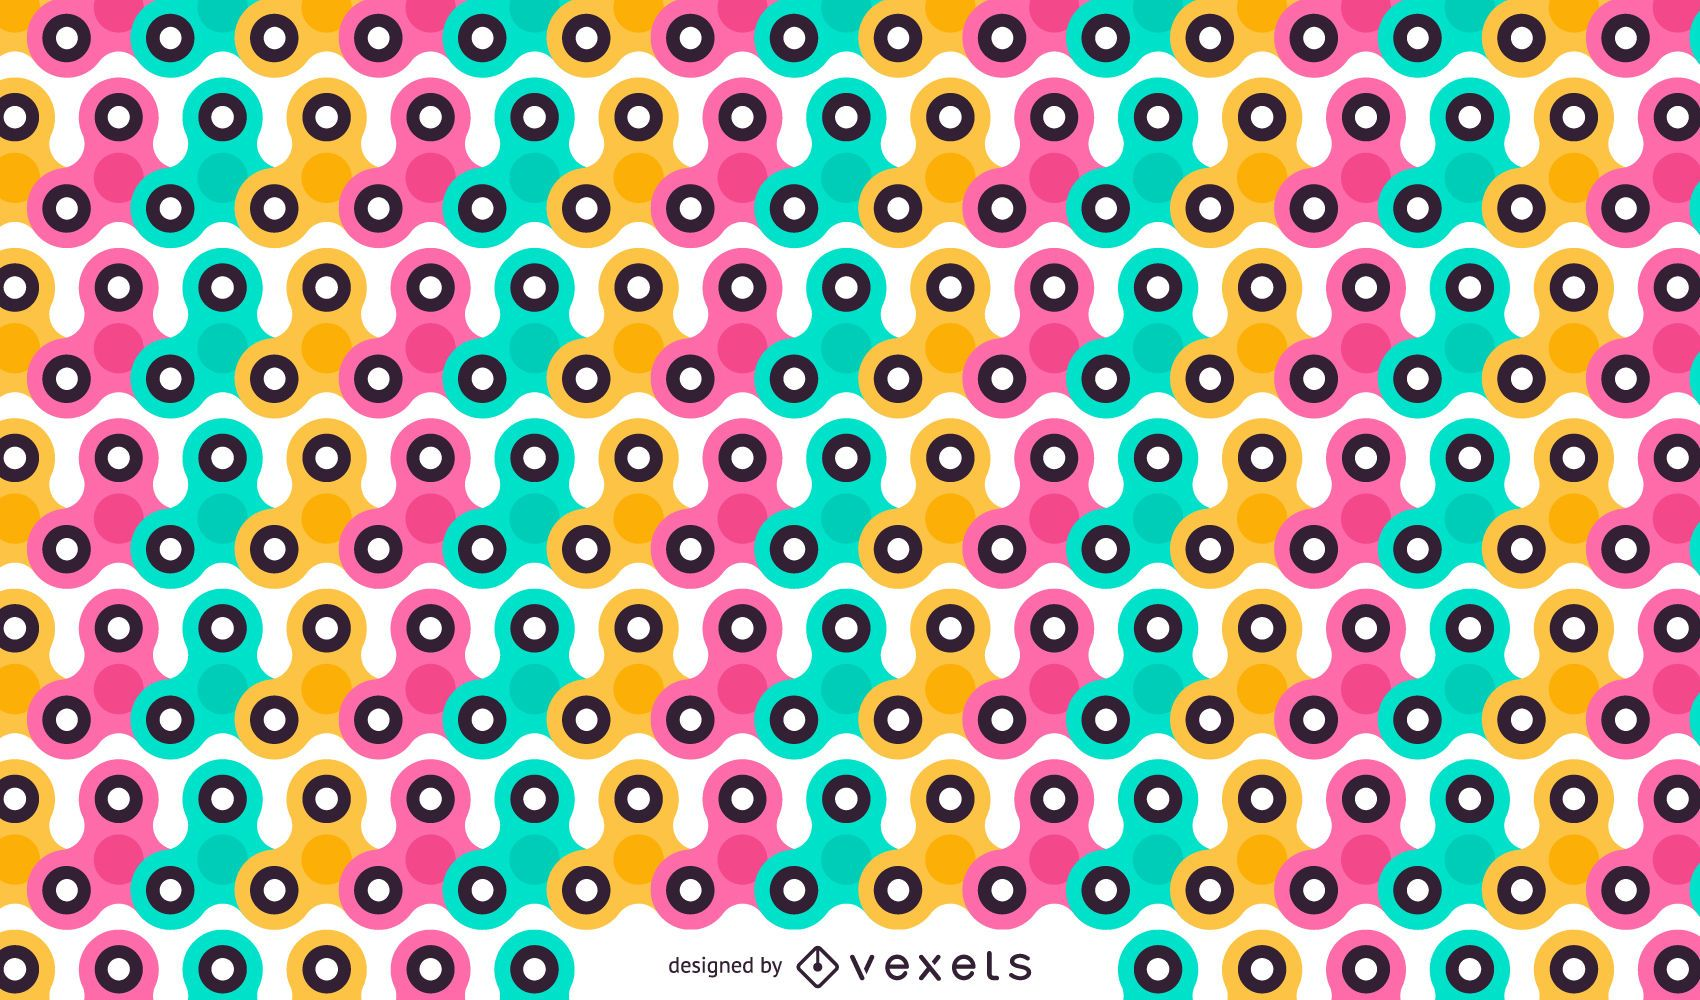 Colorful fidget spinner pattern